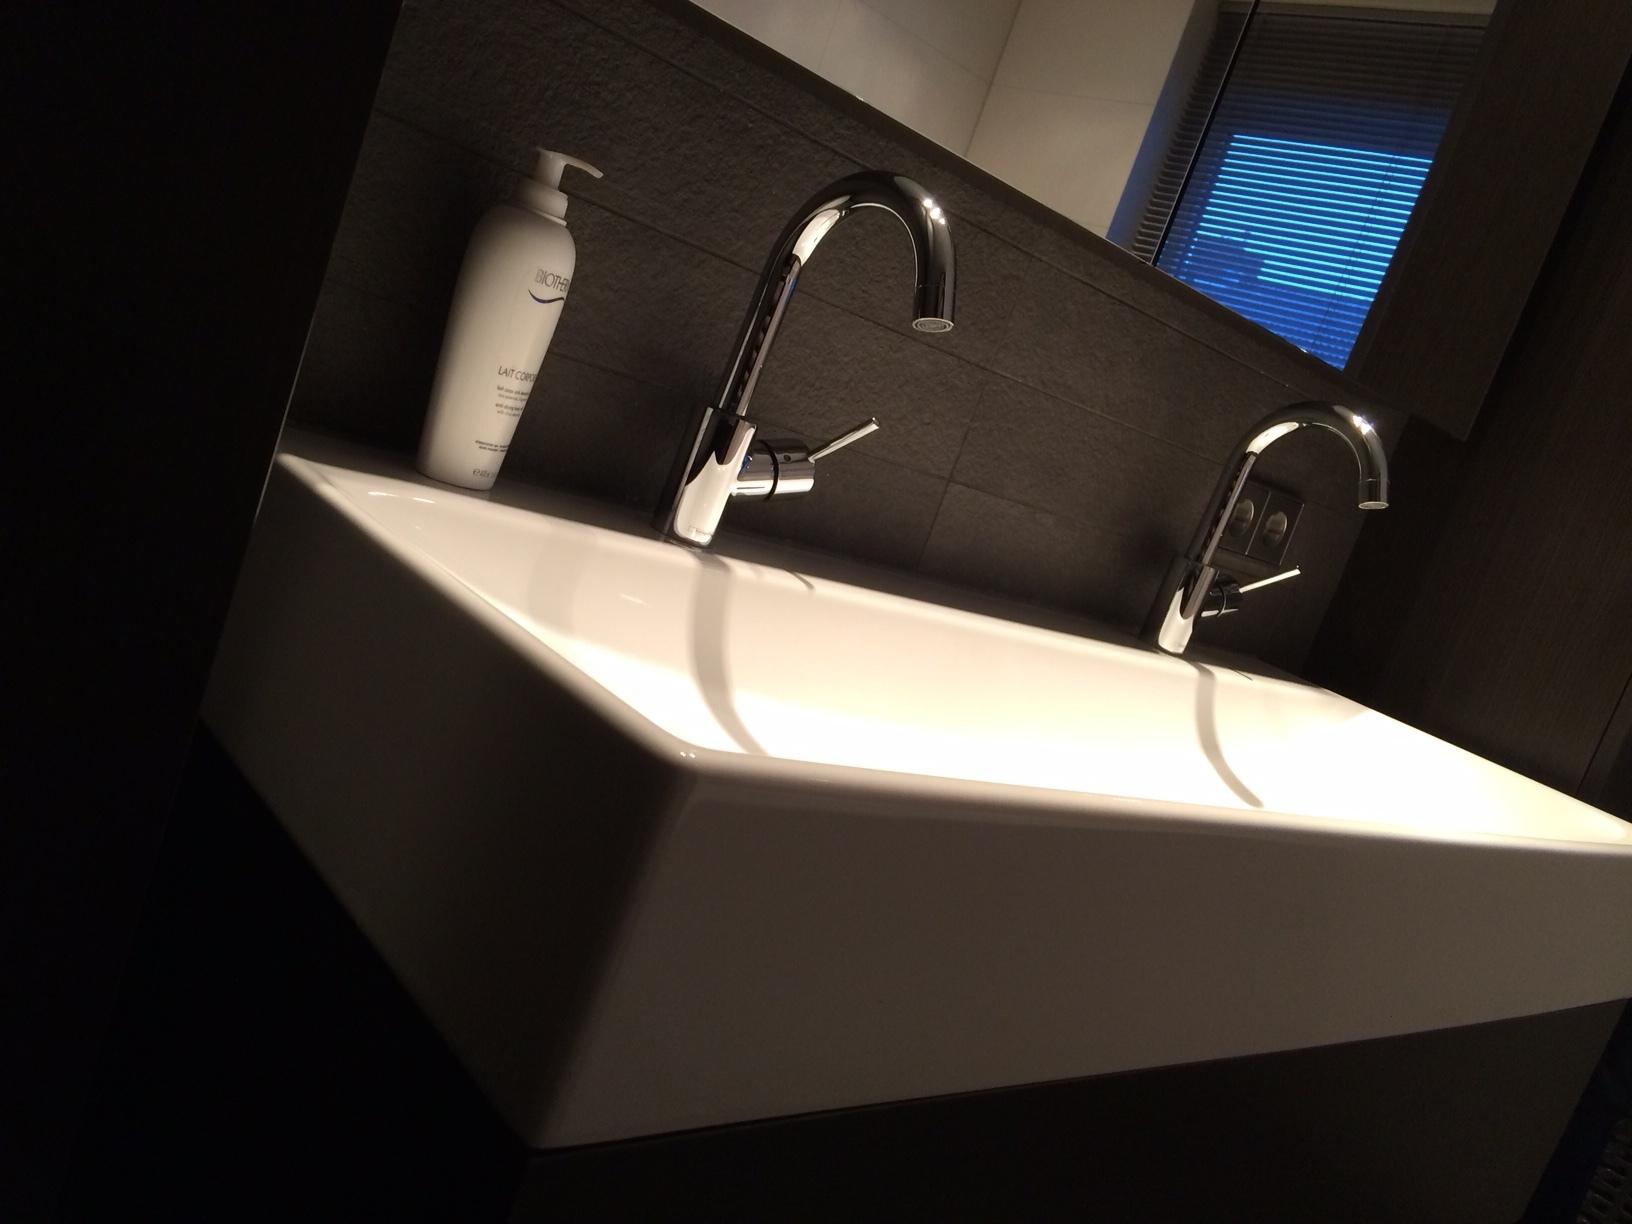 badkamermeubel-op-maat-6